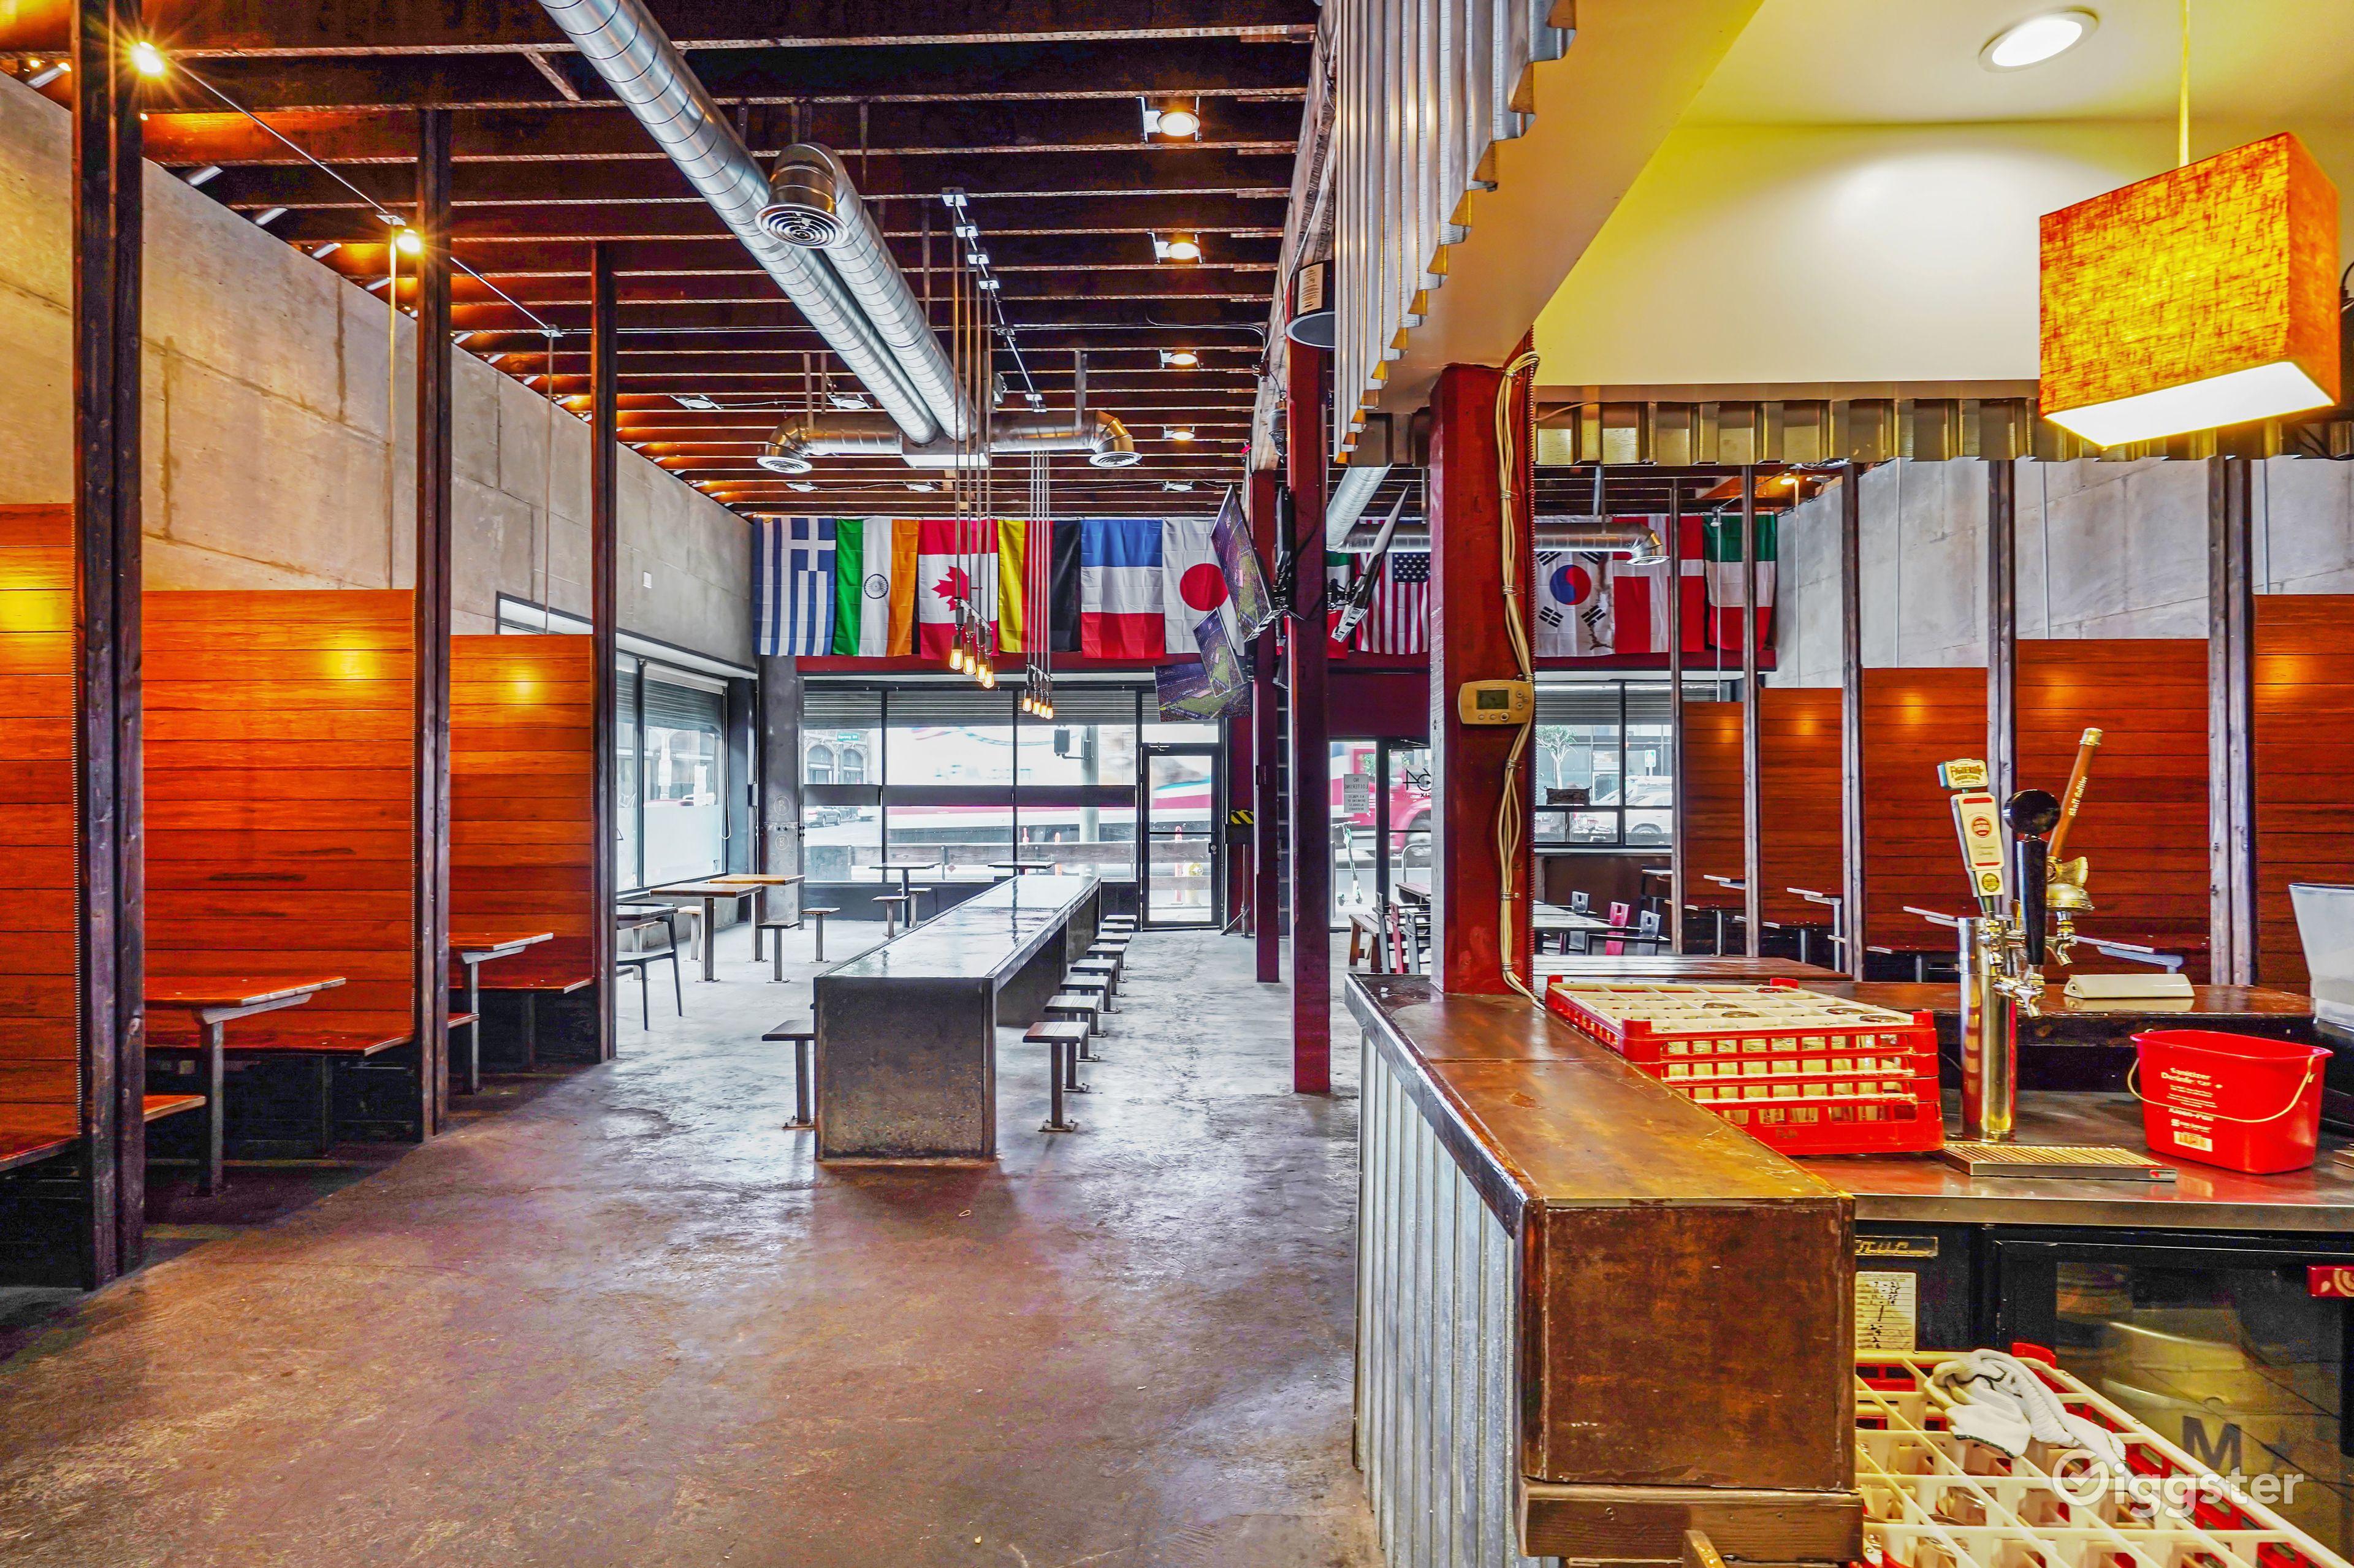 Rustic Modern Gastropub Restaurant Sports Bar Rent This Location On Giggster